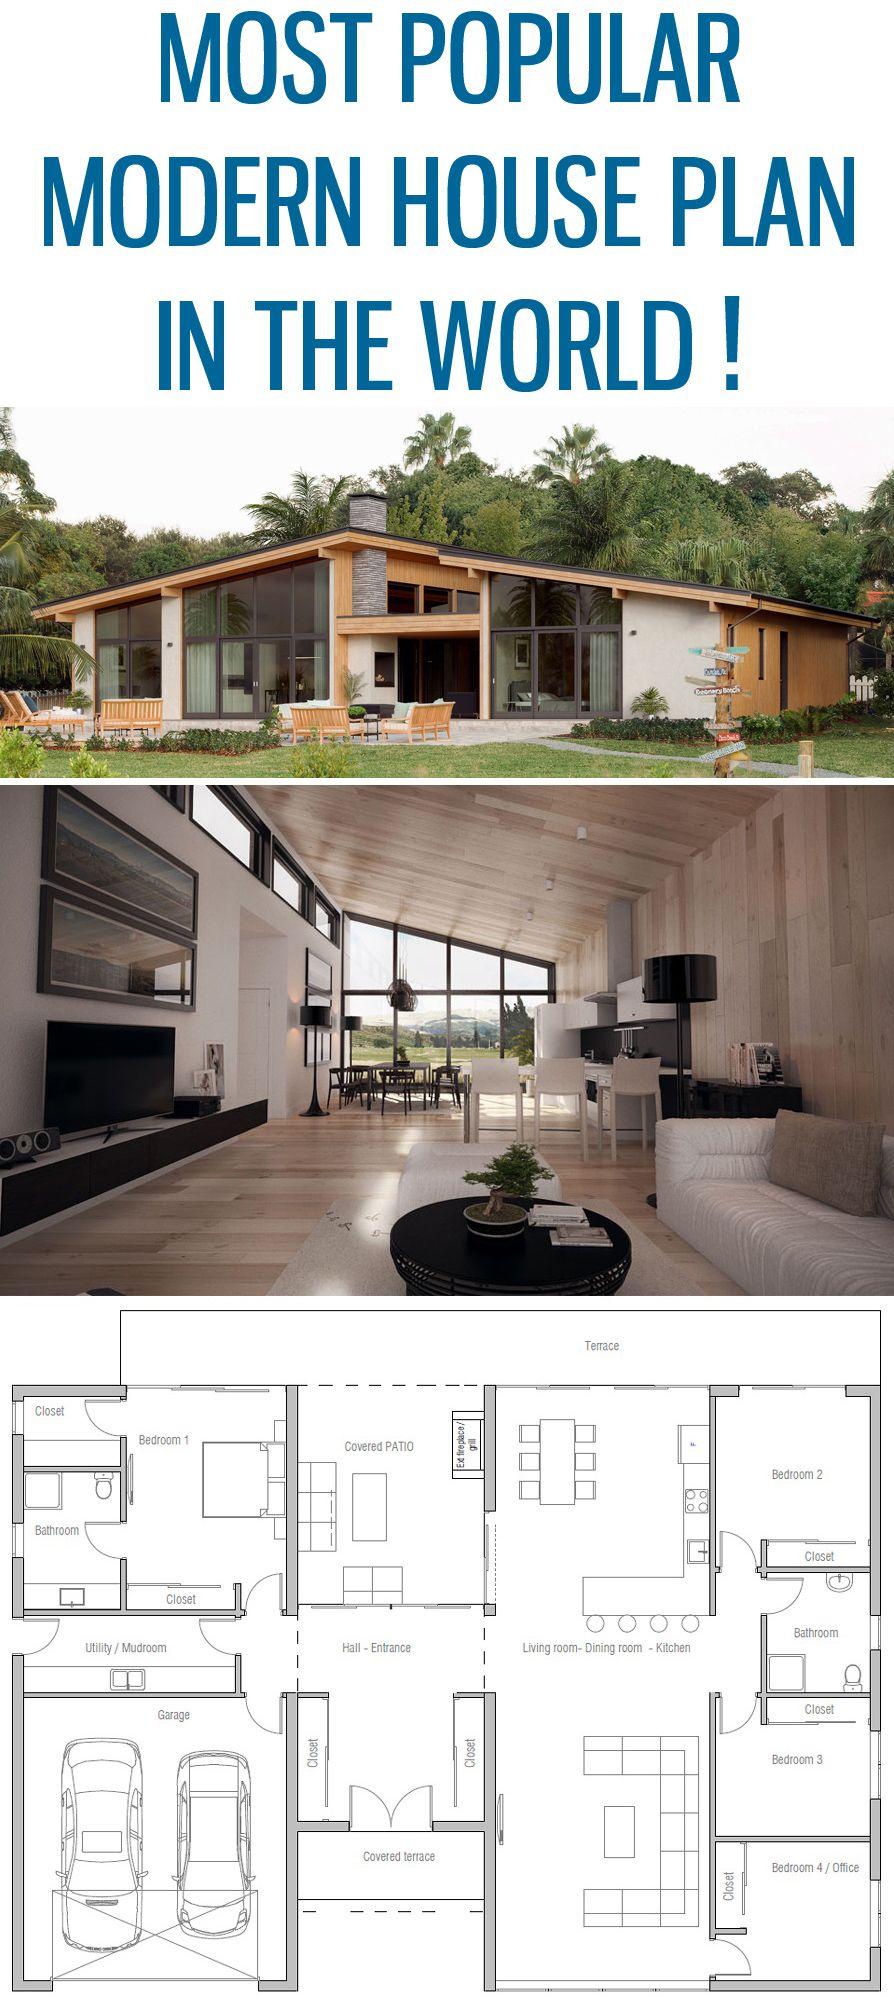 Most Popular Modern House Plan Home Plan Floor Plan House Plan Architecture House Plans Modern House Plan Modern House Plans